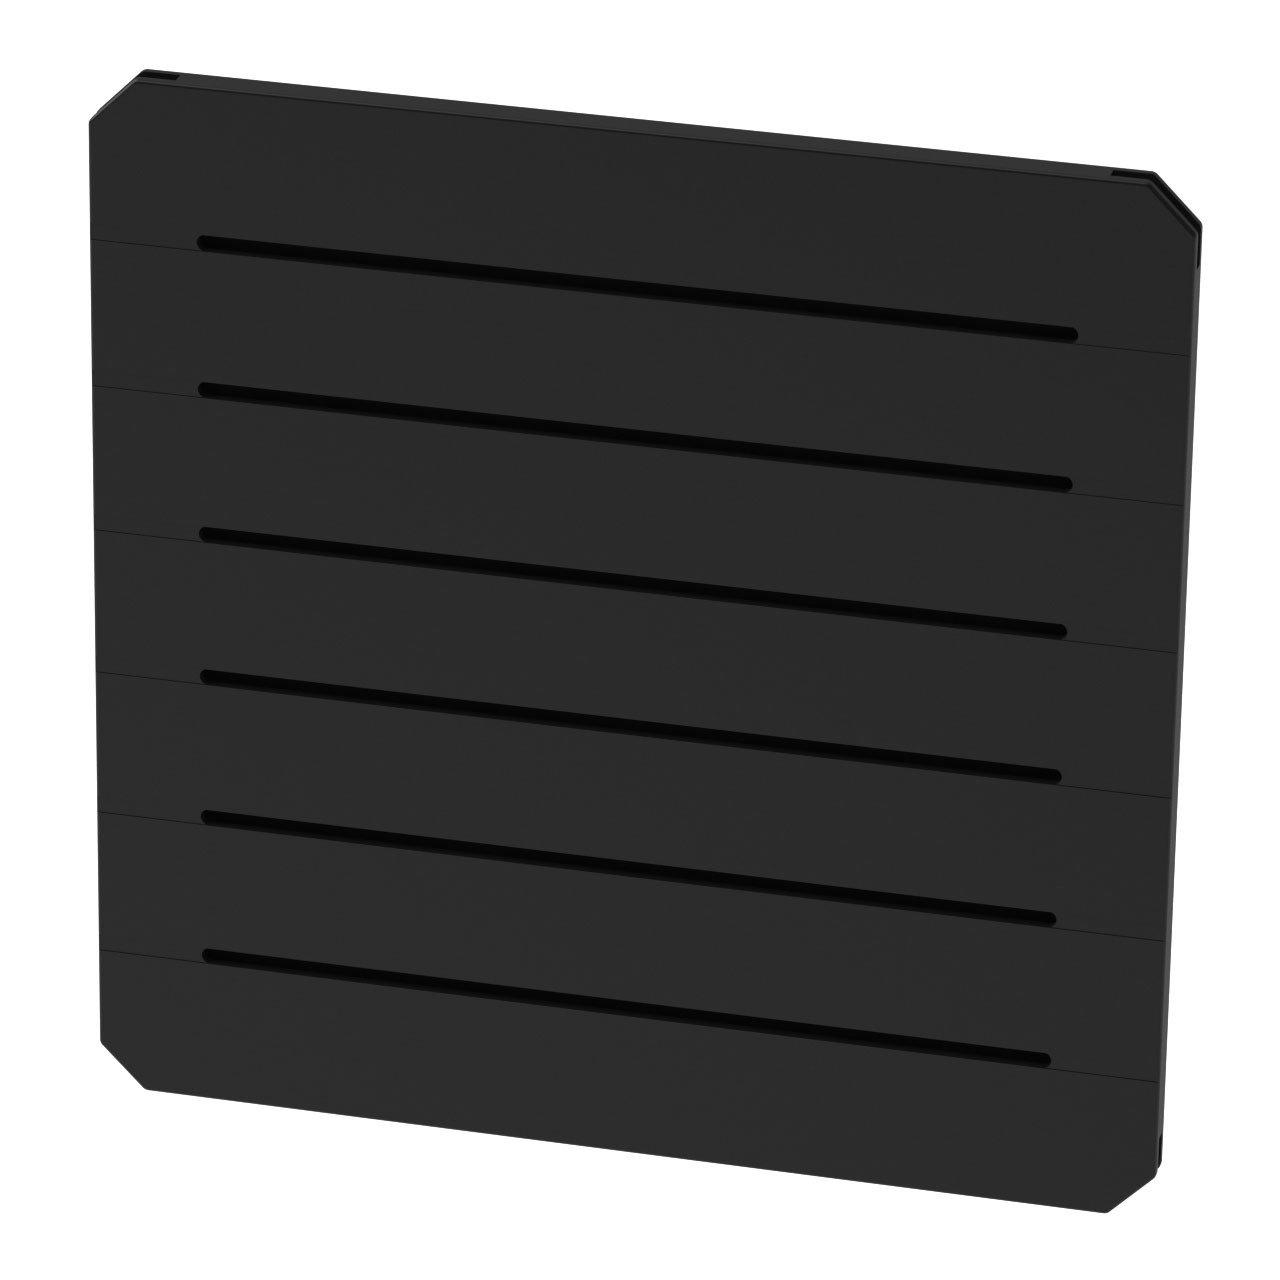 GOGO Panels - P1BB - Black - Standard Panel 2' x 2' - 1 Panel